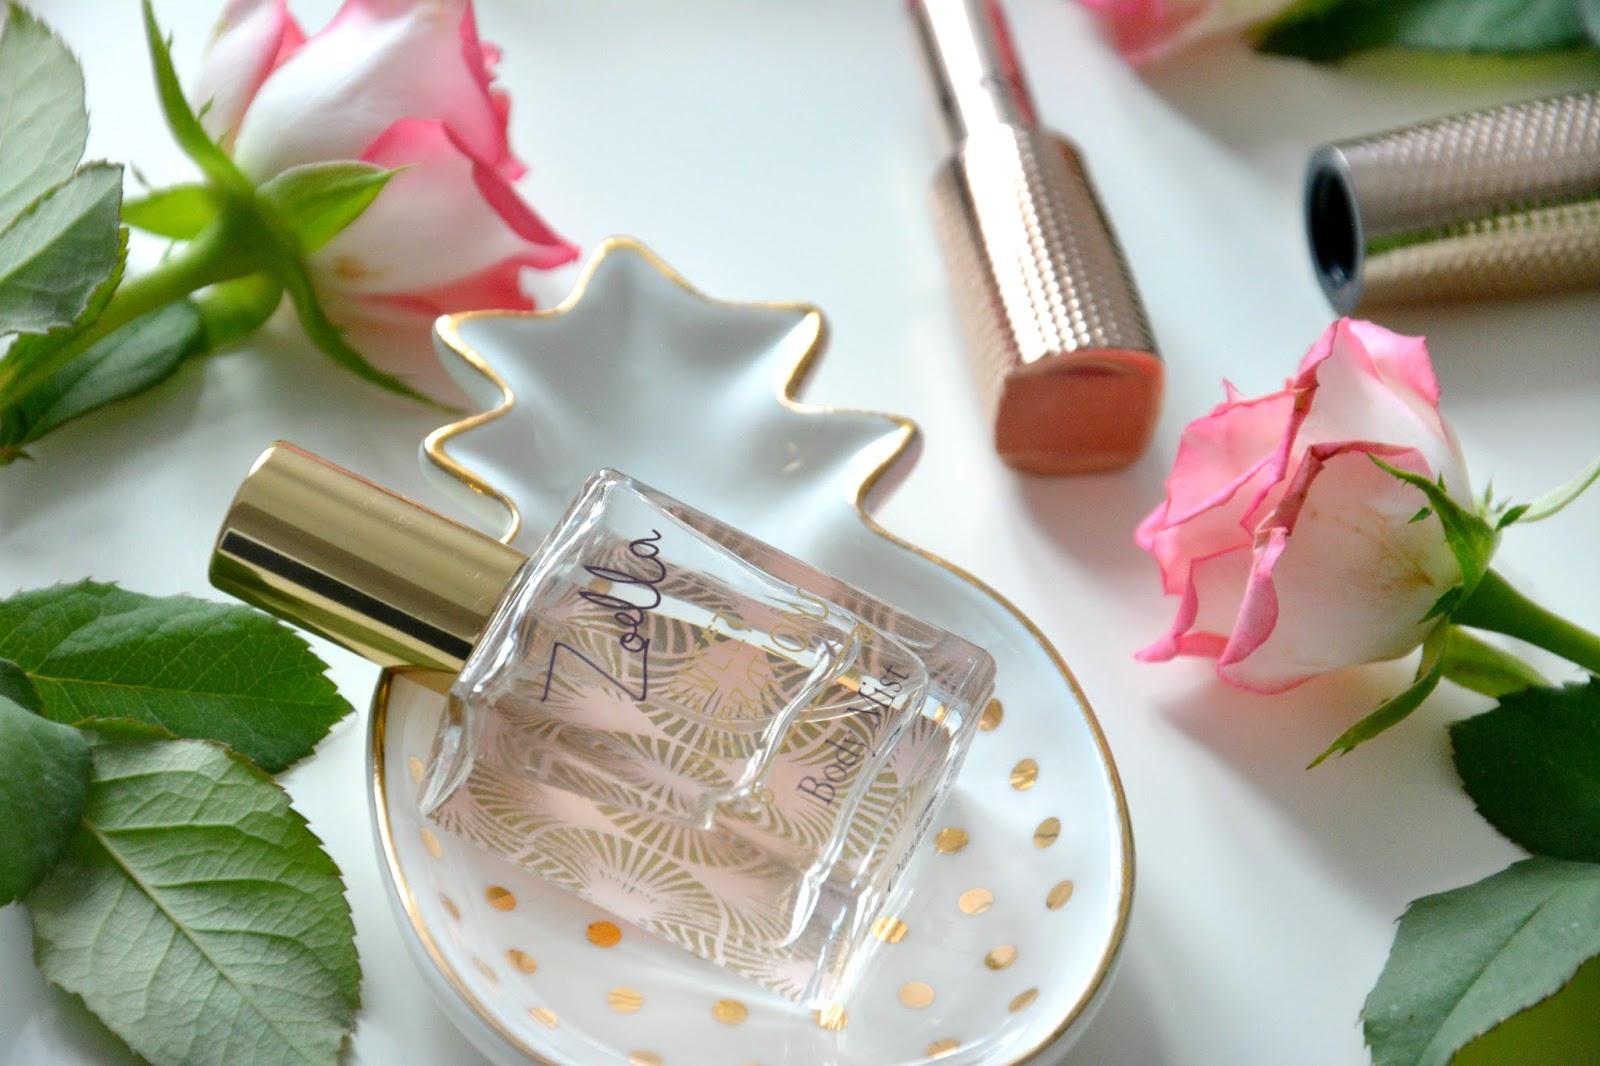 Zoella Sweet Inspirations Beauty Mist; Kiko Lipstick; Fresh Pink Roses